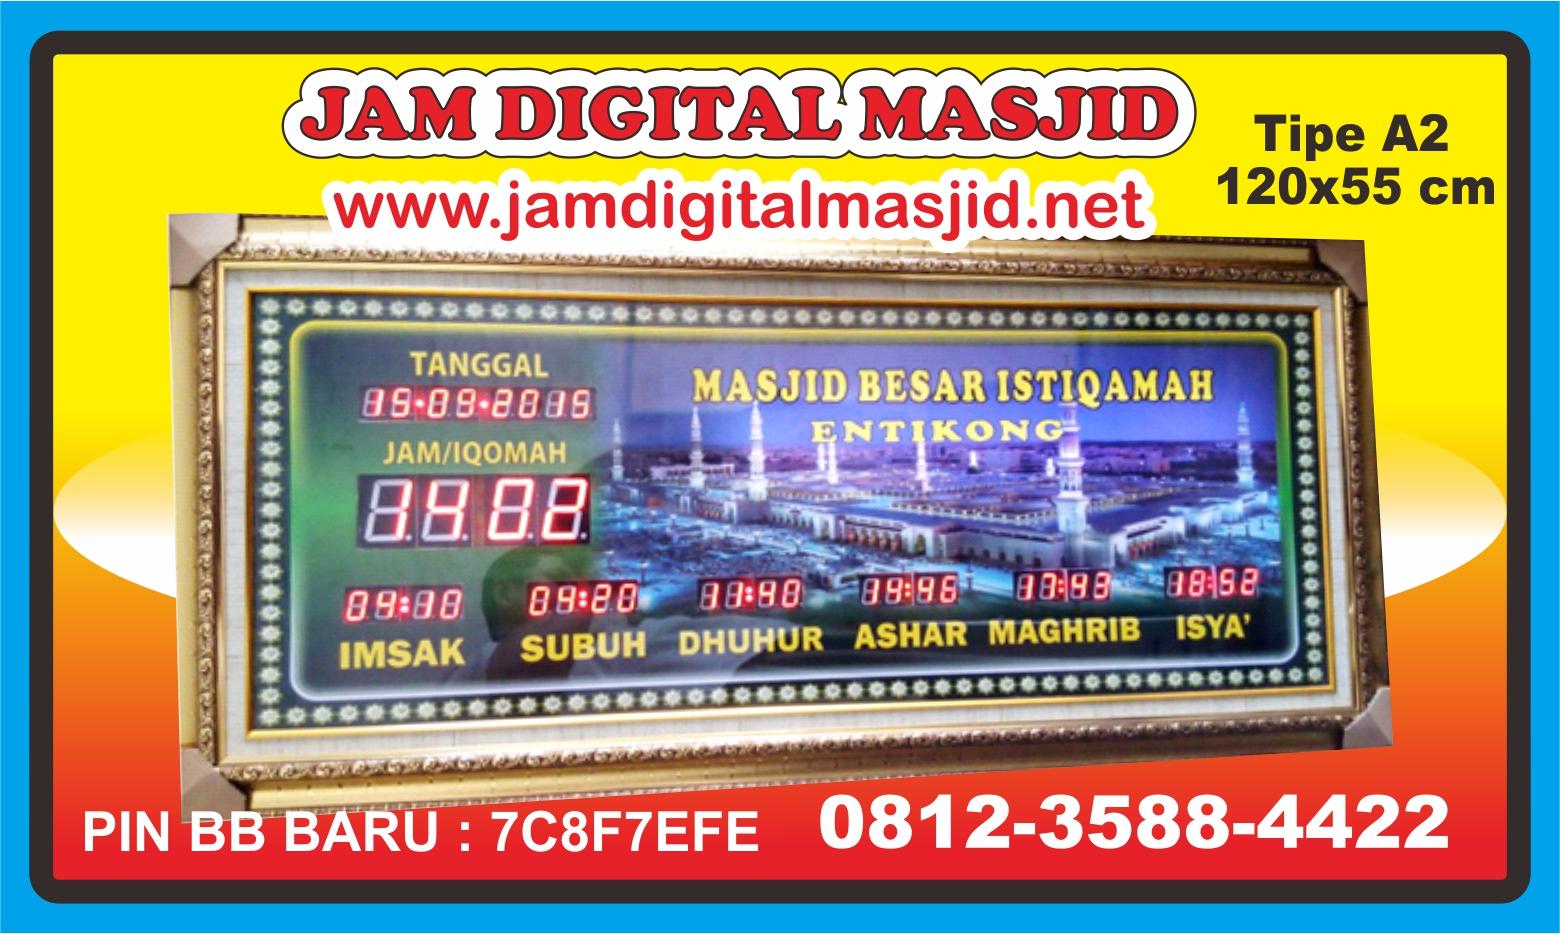 jam-digital-masjid-besar-istiqamah-entikong-kalimantan-net